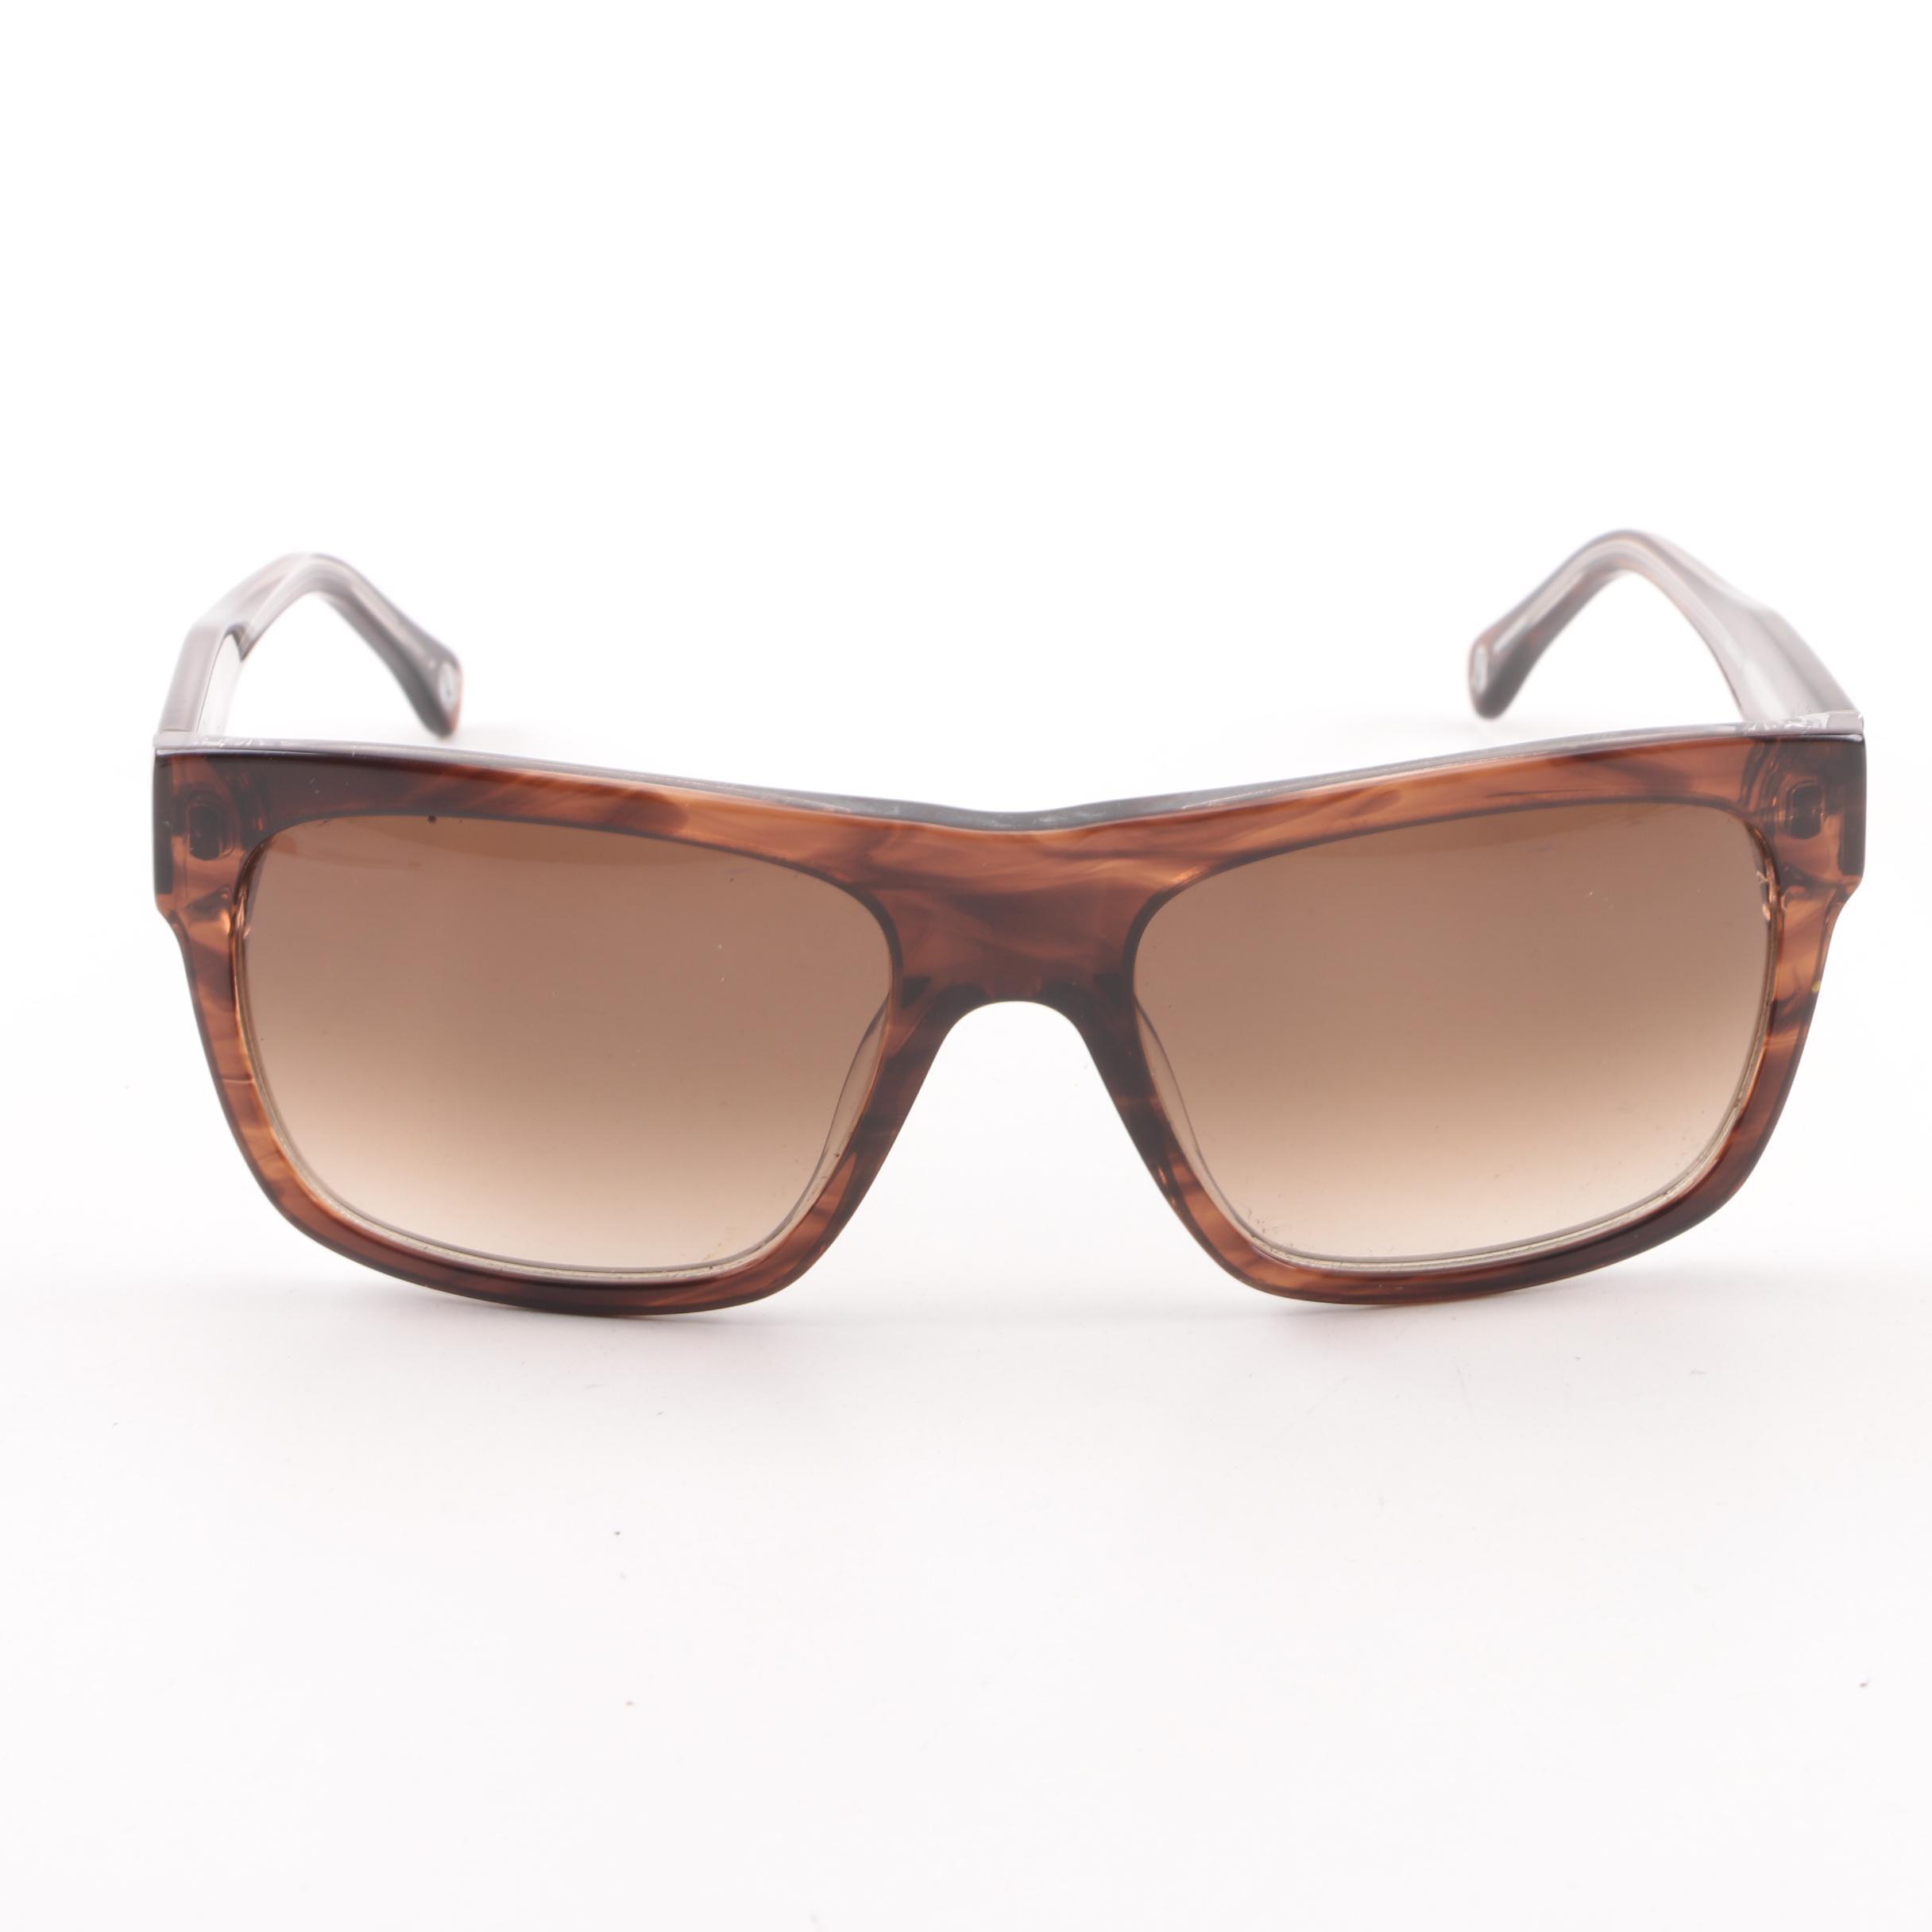 Jack Spade Bennett Sunglasses